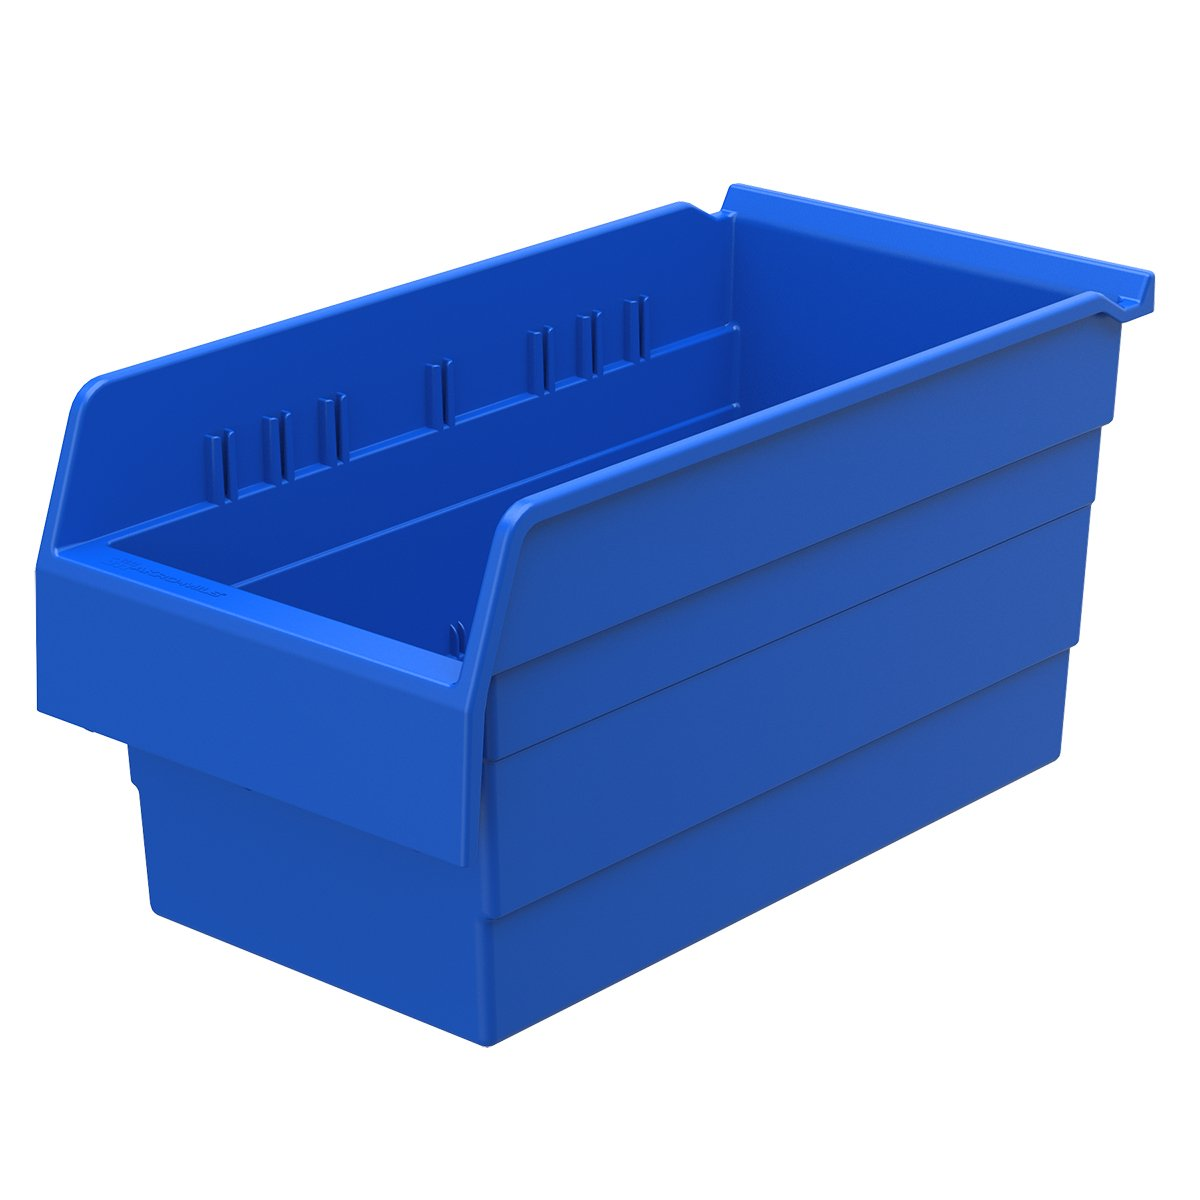 Akro-Mils 30886 ShelfMax 8 Plastic Nesting Shelf Bin Box, 16-Inch x 8-Inch x 8-Inch, Blue, 8-Pack